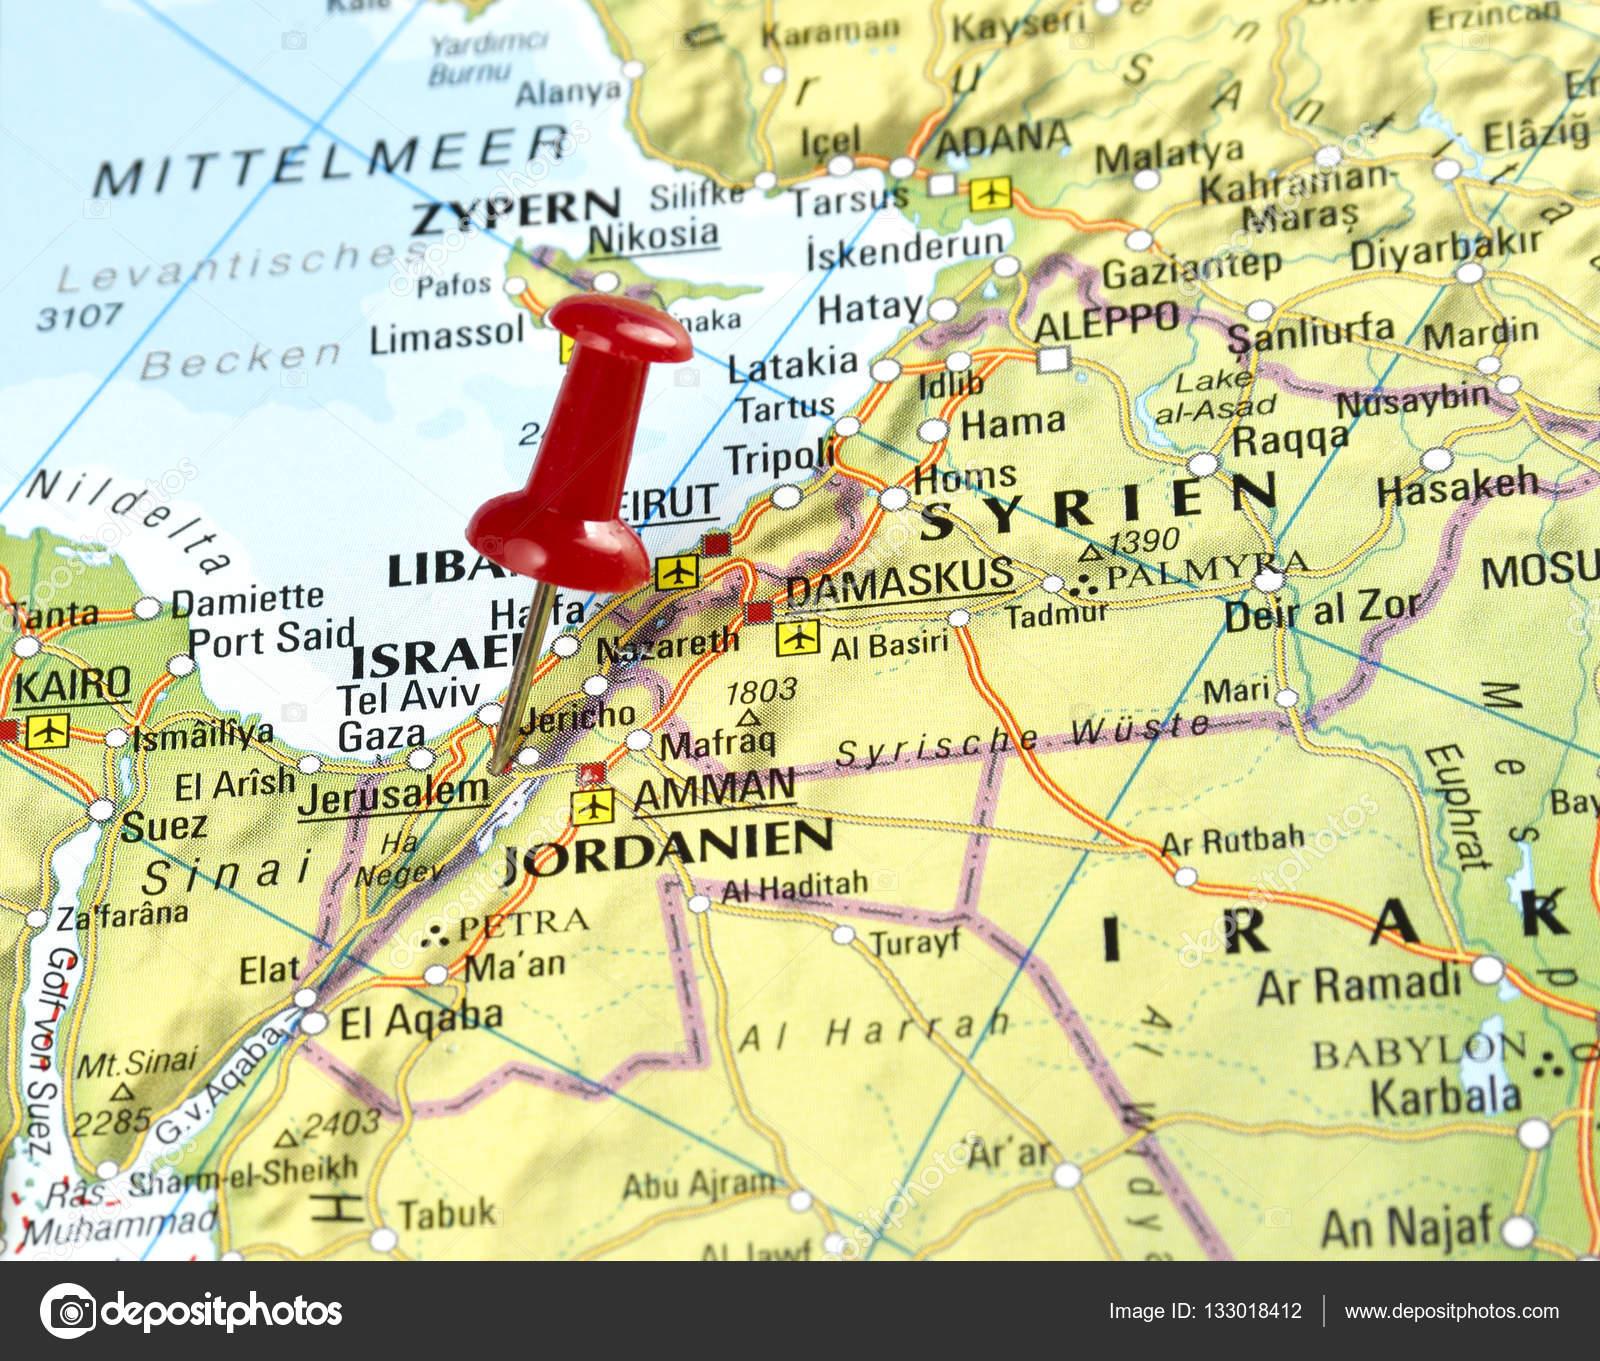 Israel With Pin Set On Jerusalem Stock Photo C Eivaisla 133018412